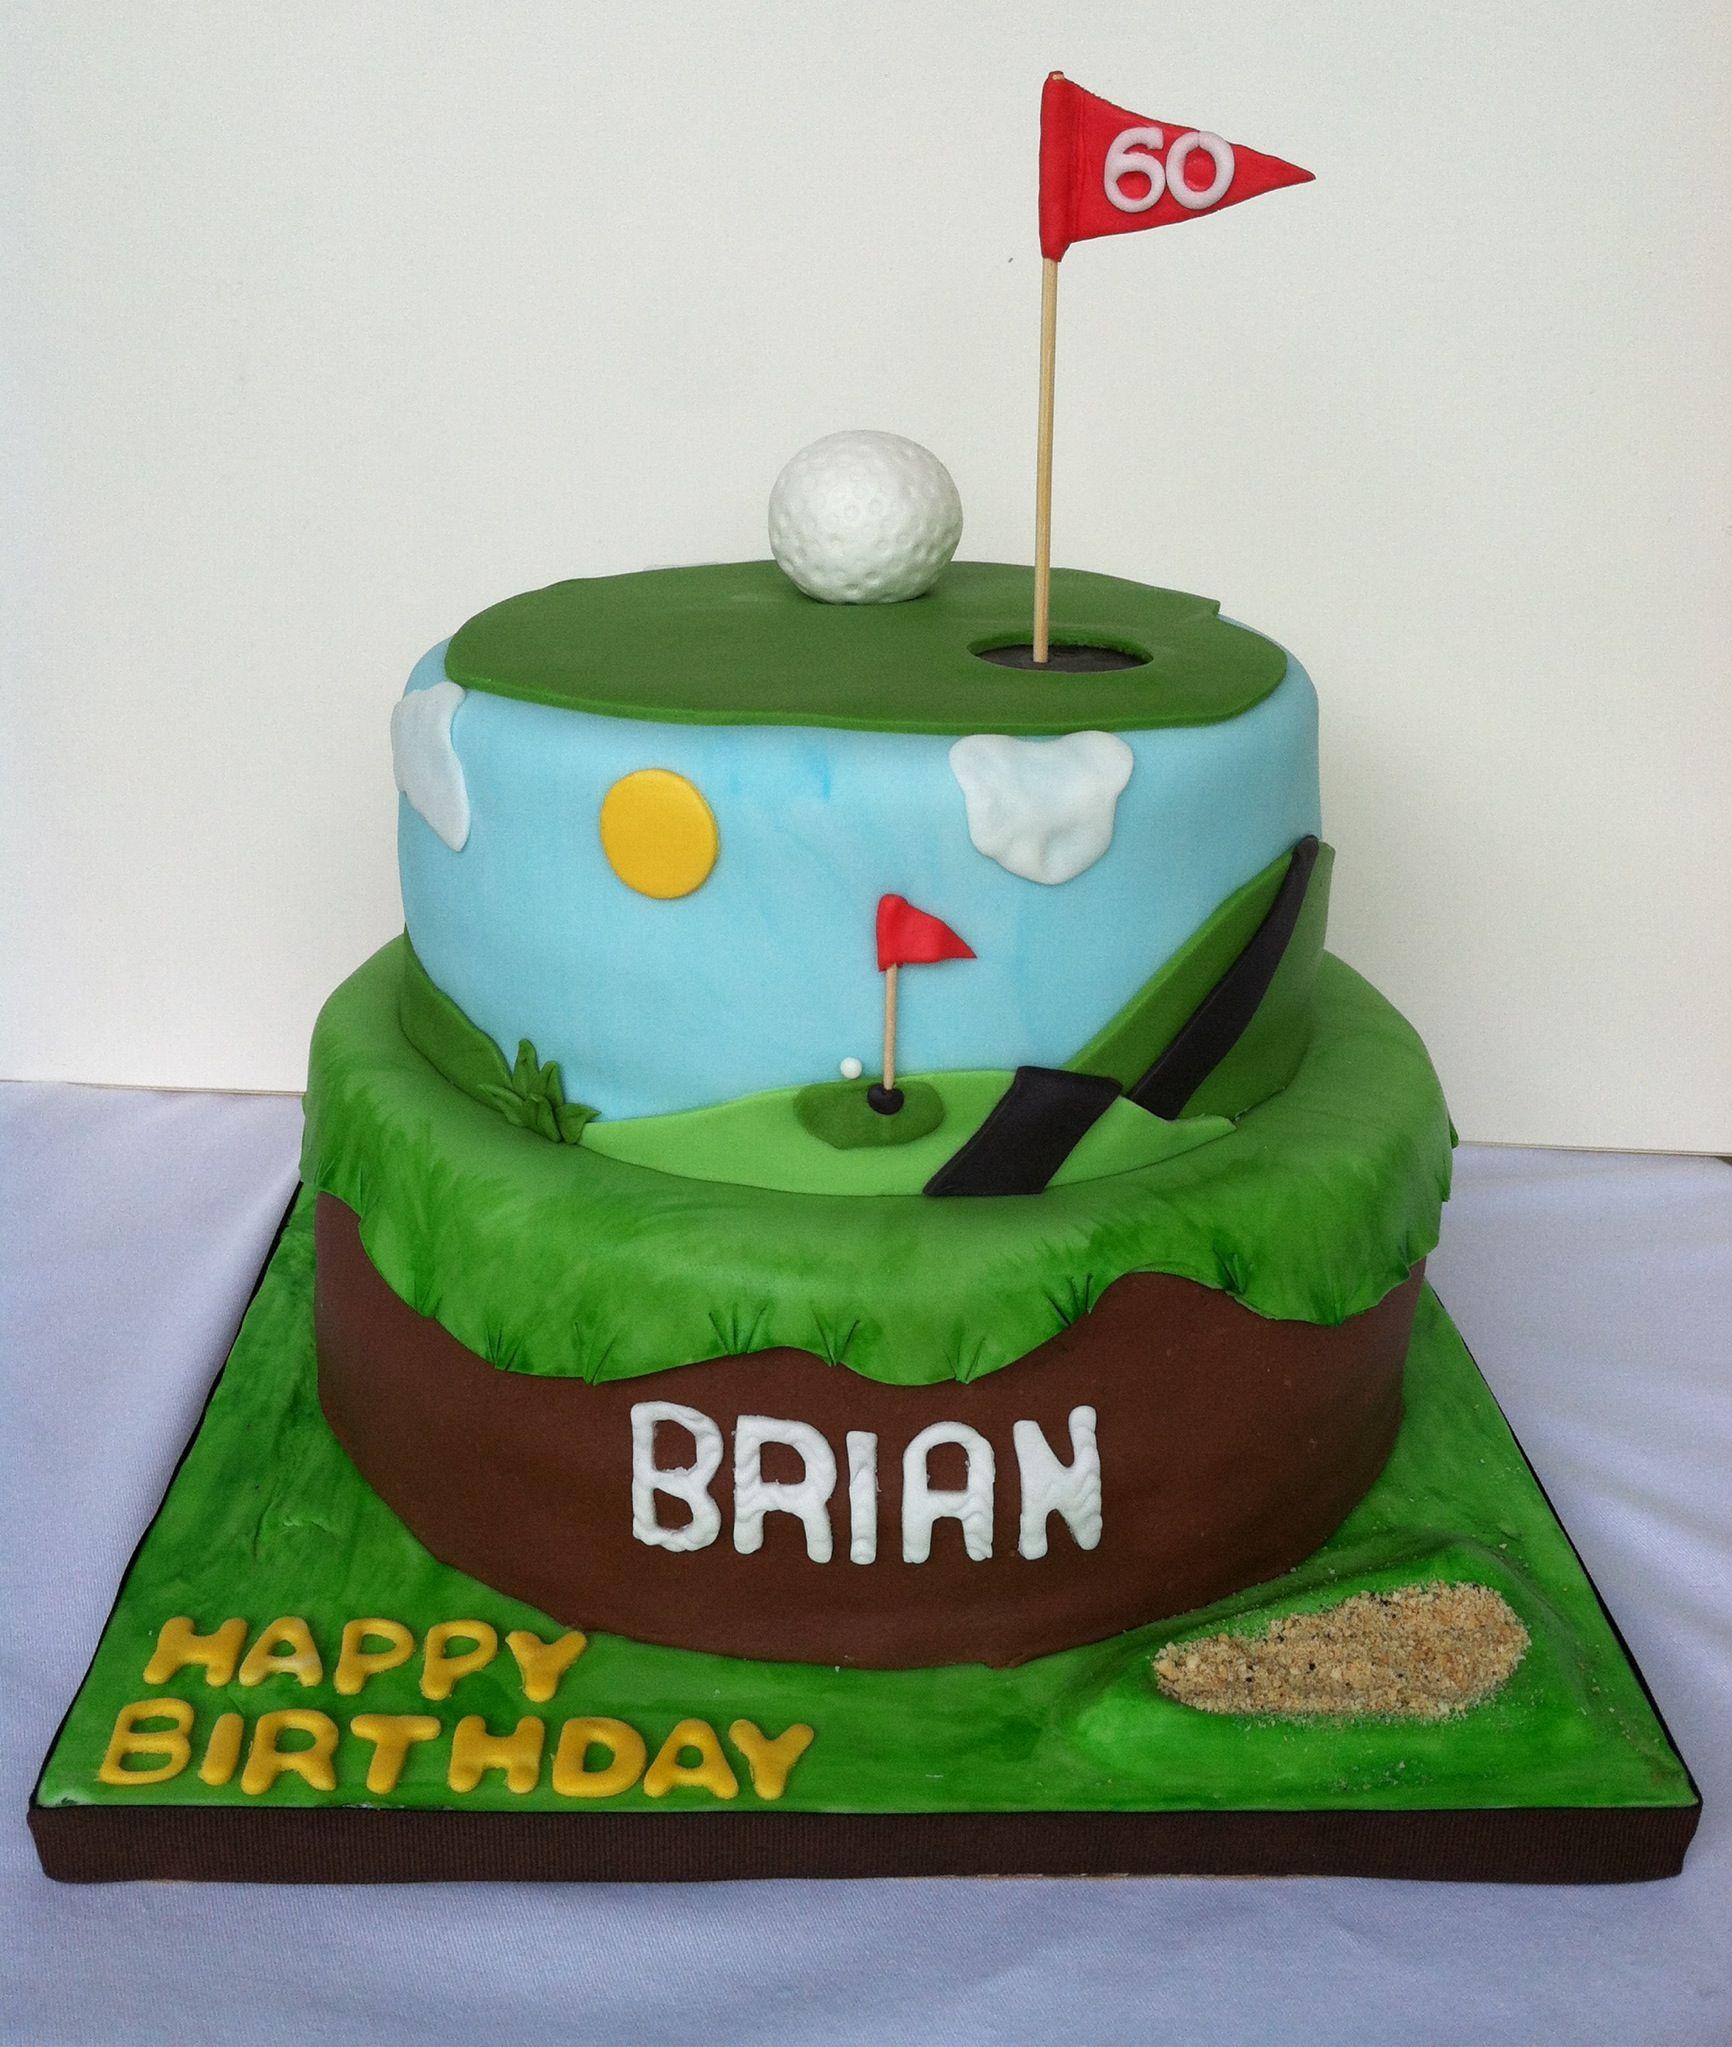 Happy 60th Birthday~ Golf Theme Chocolate Cake